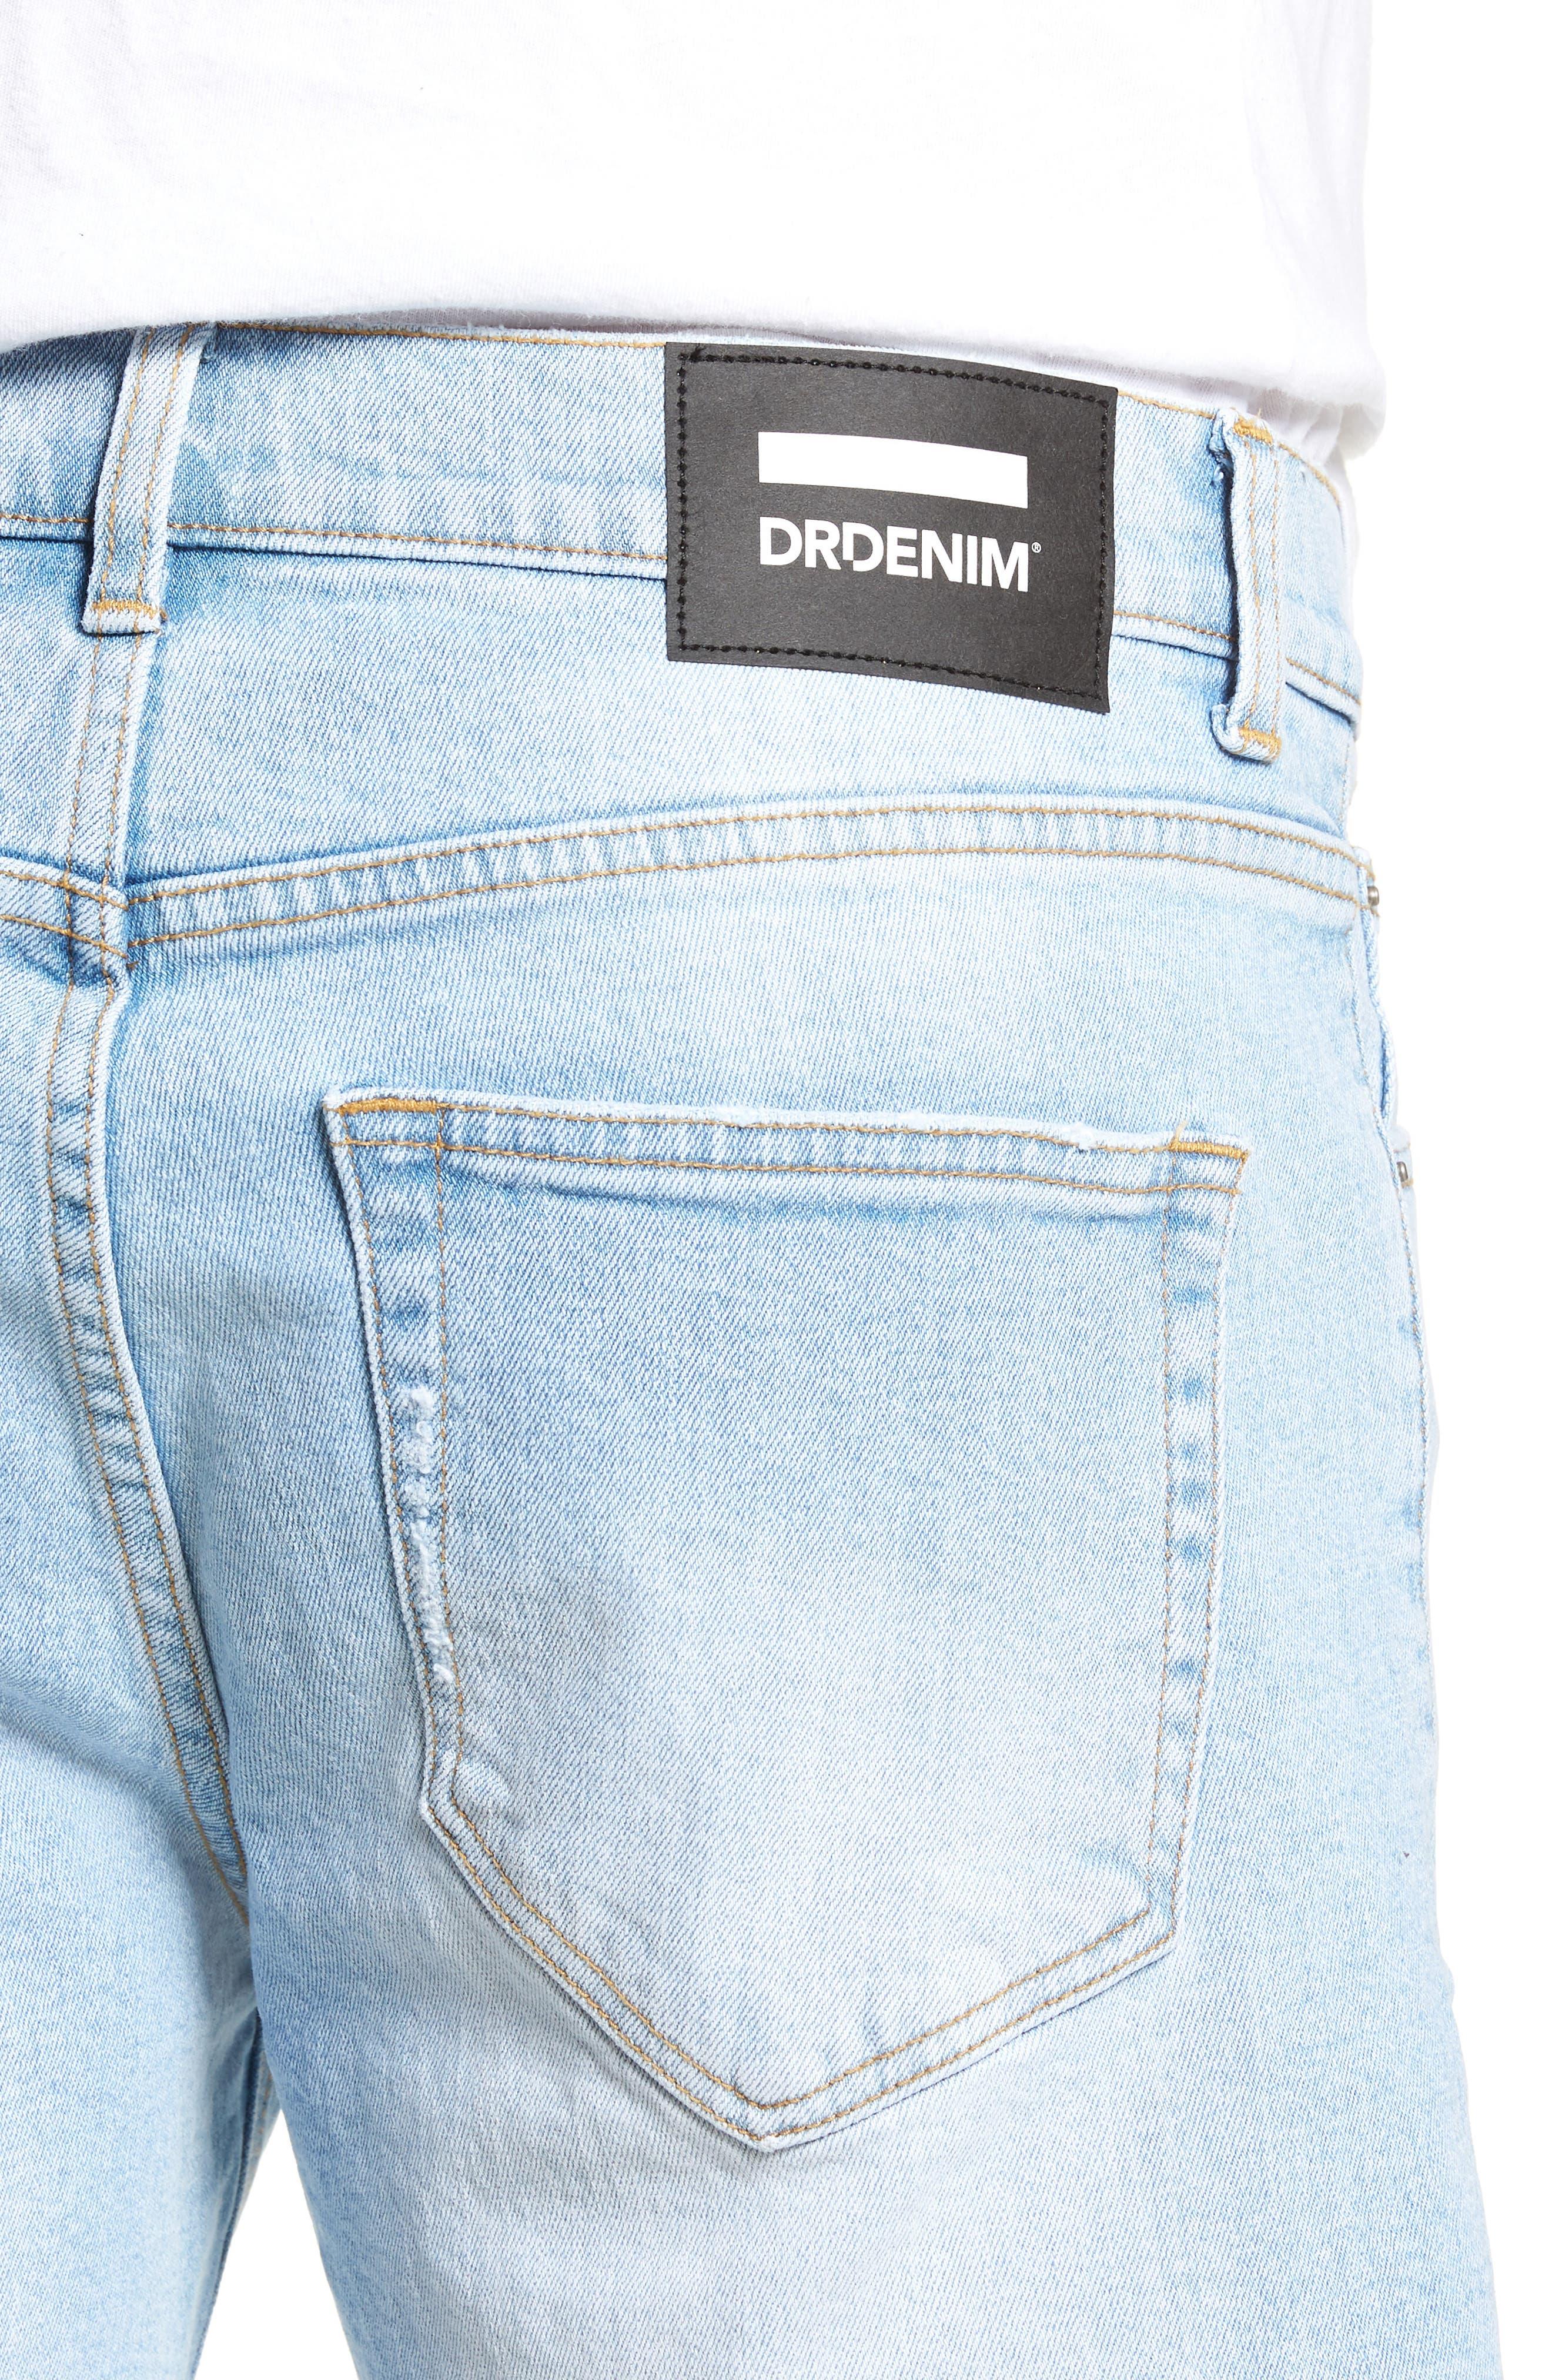 Dr. Denim Jeansmaker Denim Shorts,                             Alternate thumbnail 4, color,                             400